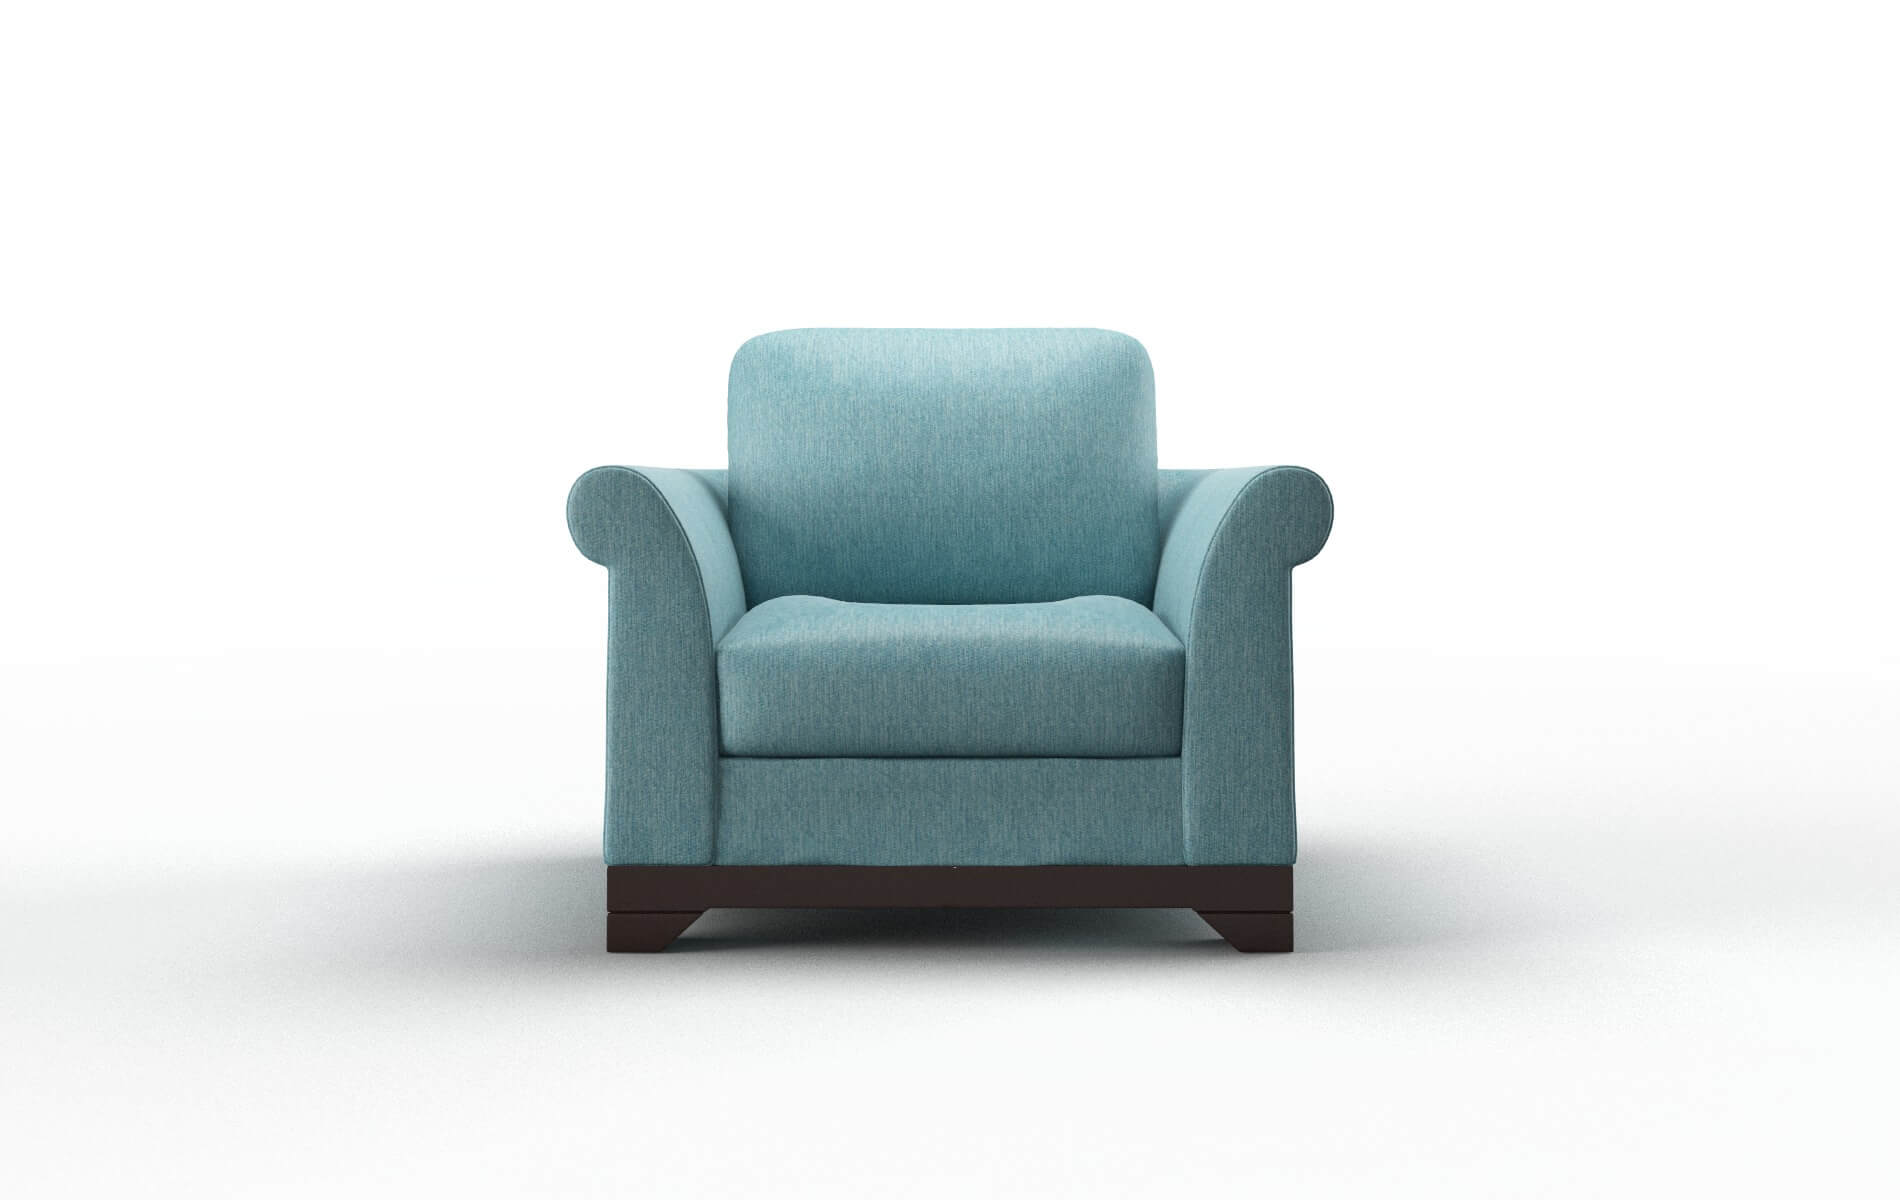 Denver Cosmo Turquoise Chair espresso legs 1